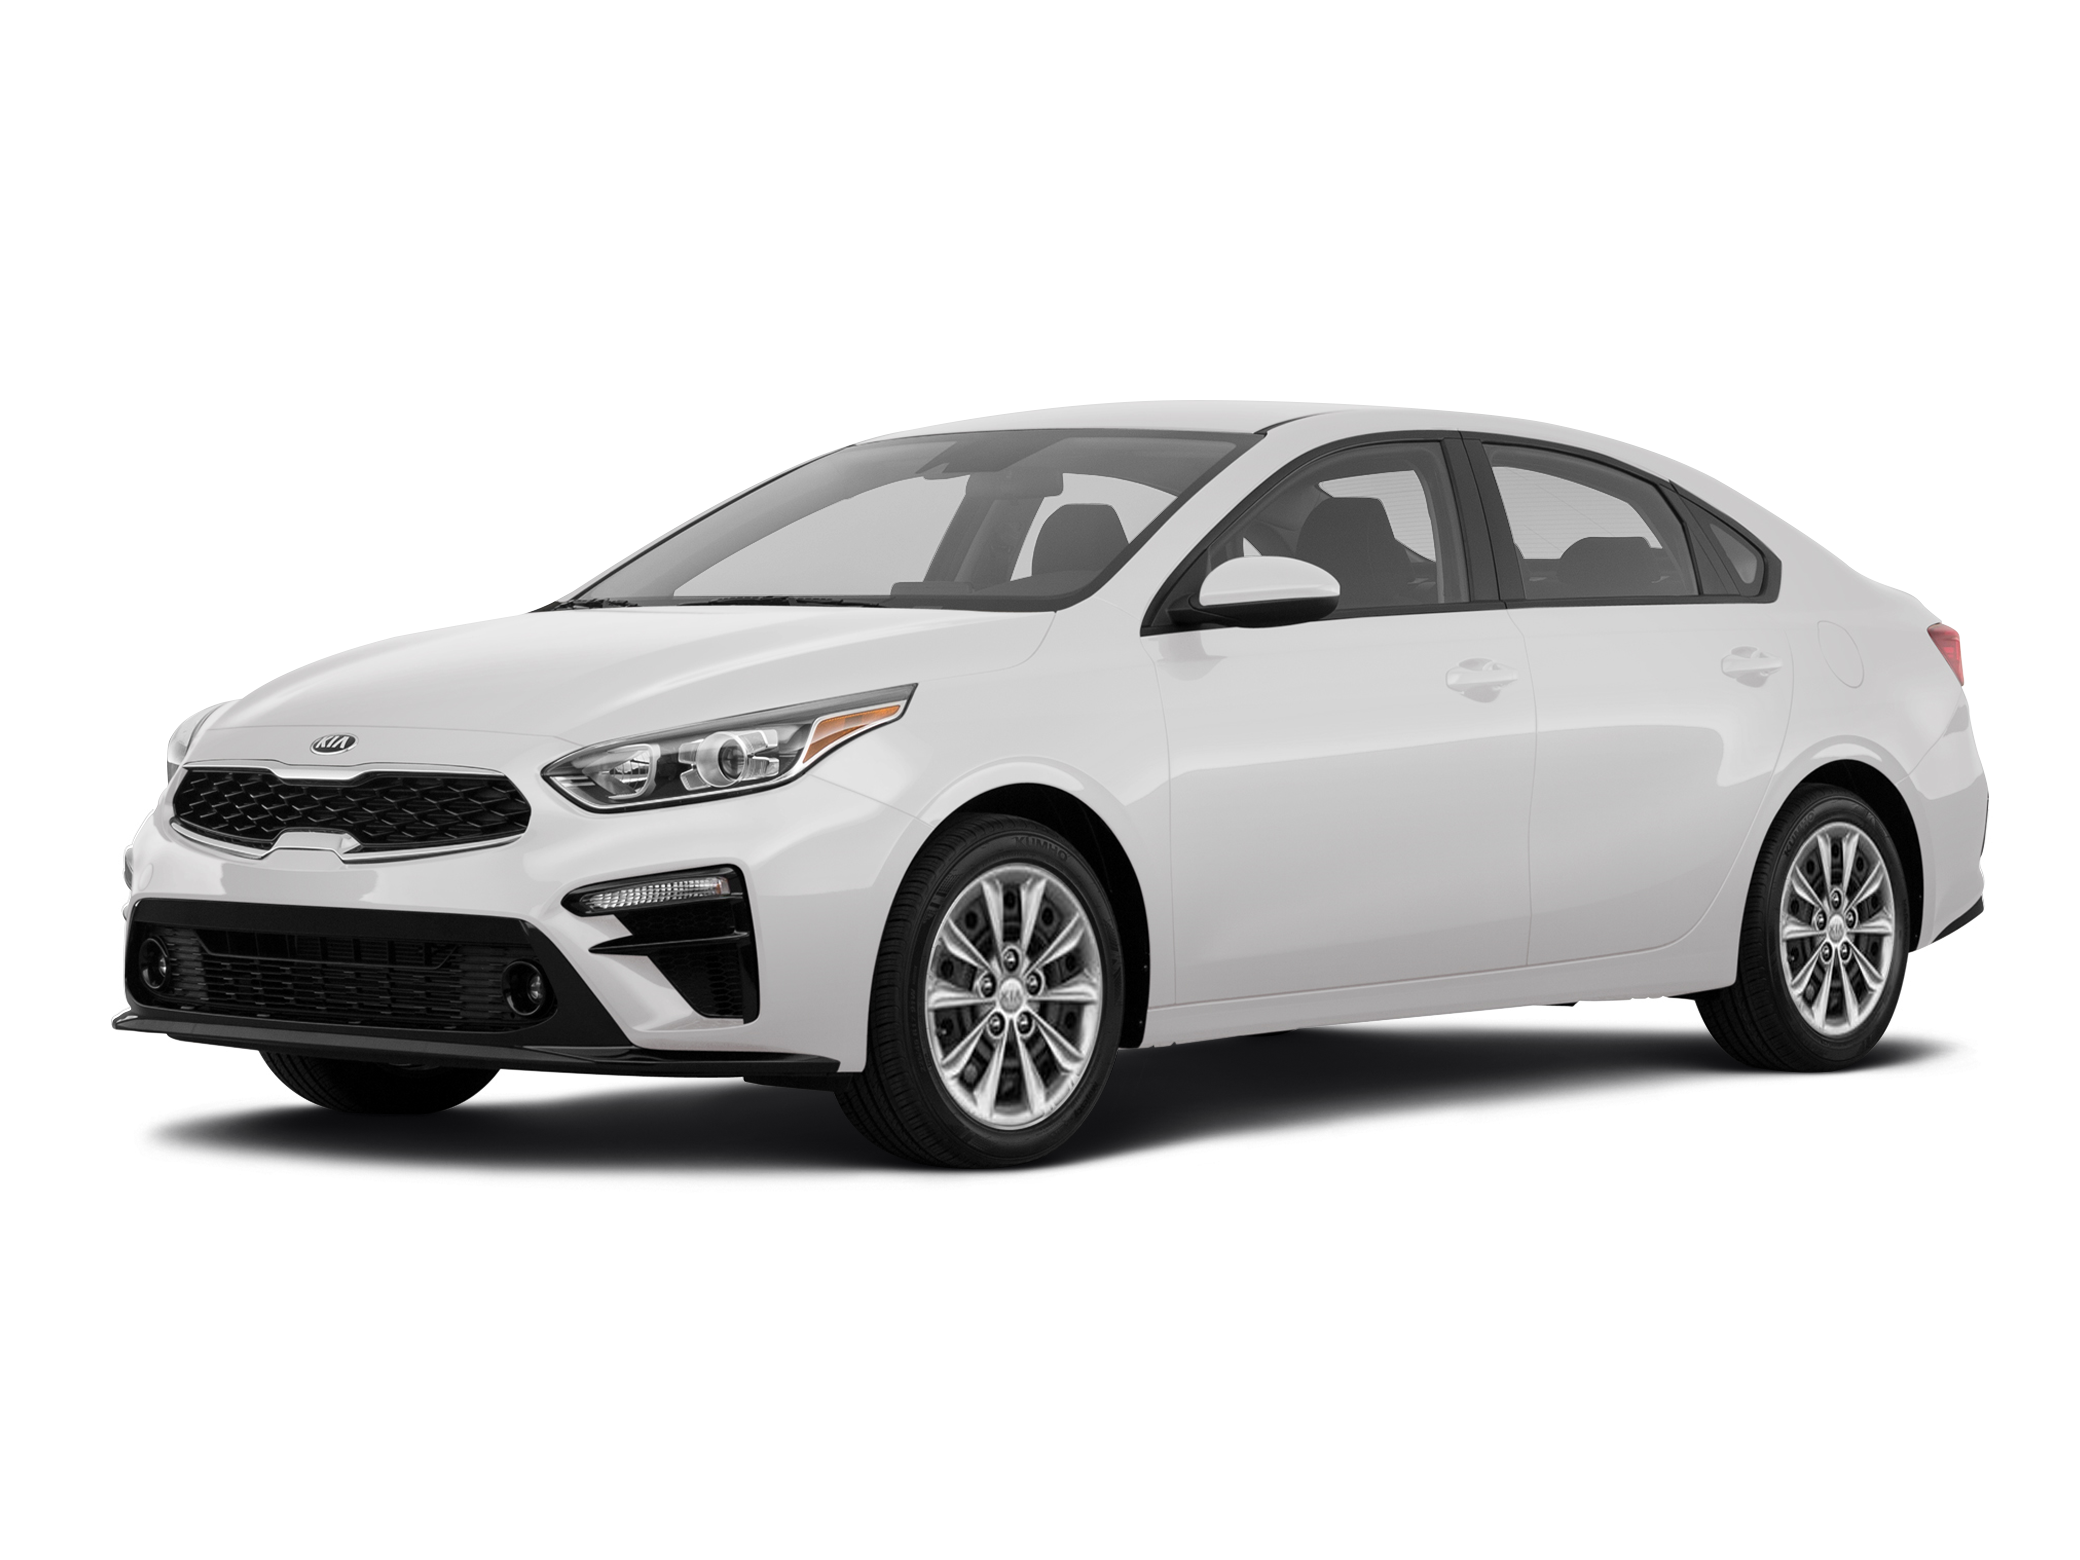 High Quality 2019 Kia Forte Sedan. 9 Offers Available